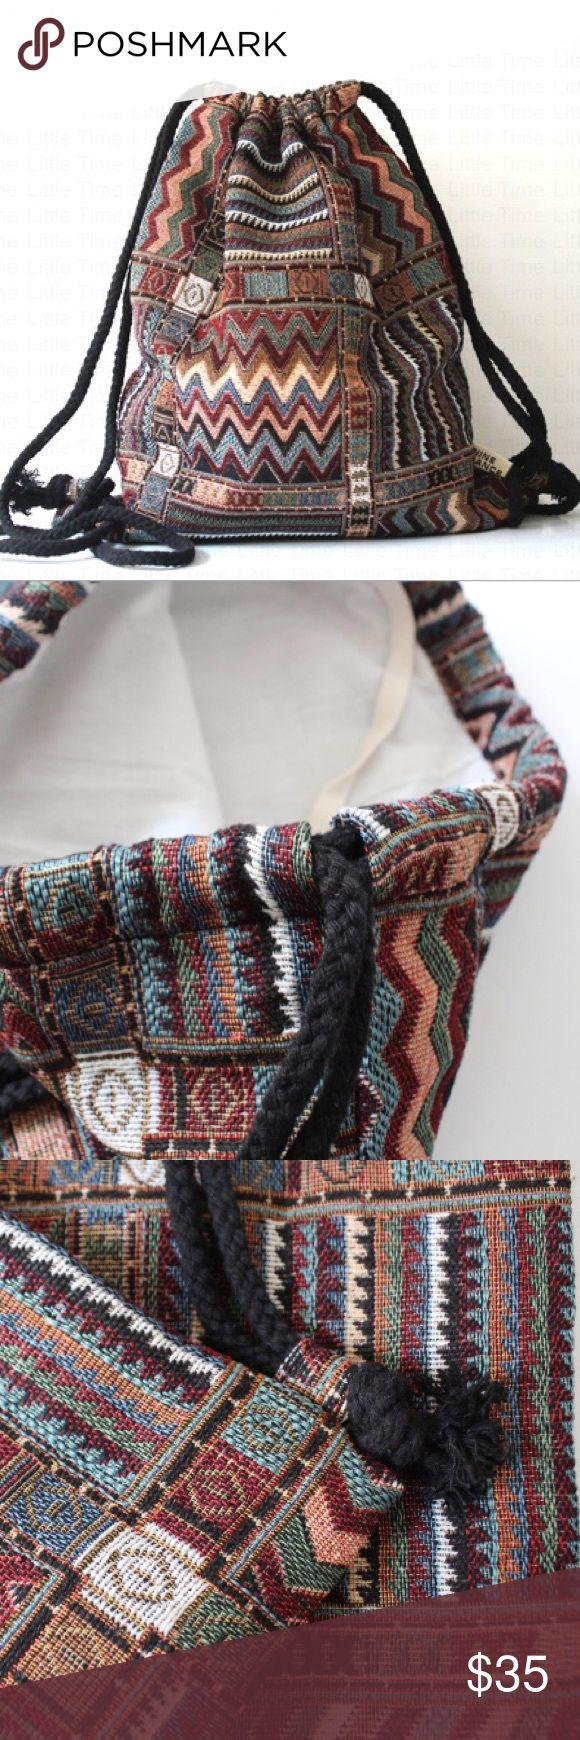 Boho Drawstring Backpack Tribal Woven String Bag! Boho Drawstring Backpack Gypsy Bohemian Chic Hippie Tribal Woven String Bag!  Handcrafted woven fabric handbag. Bags Shoulder Bags